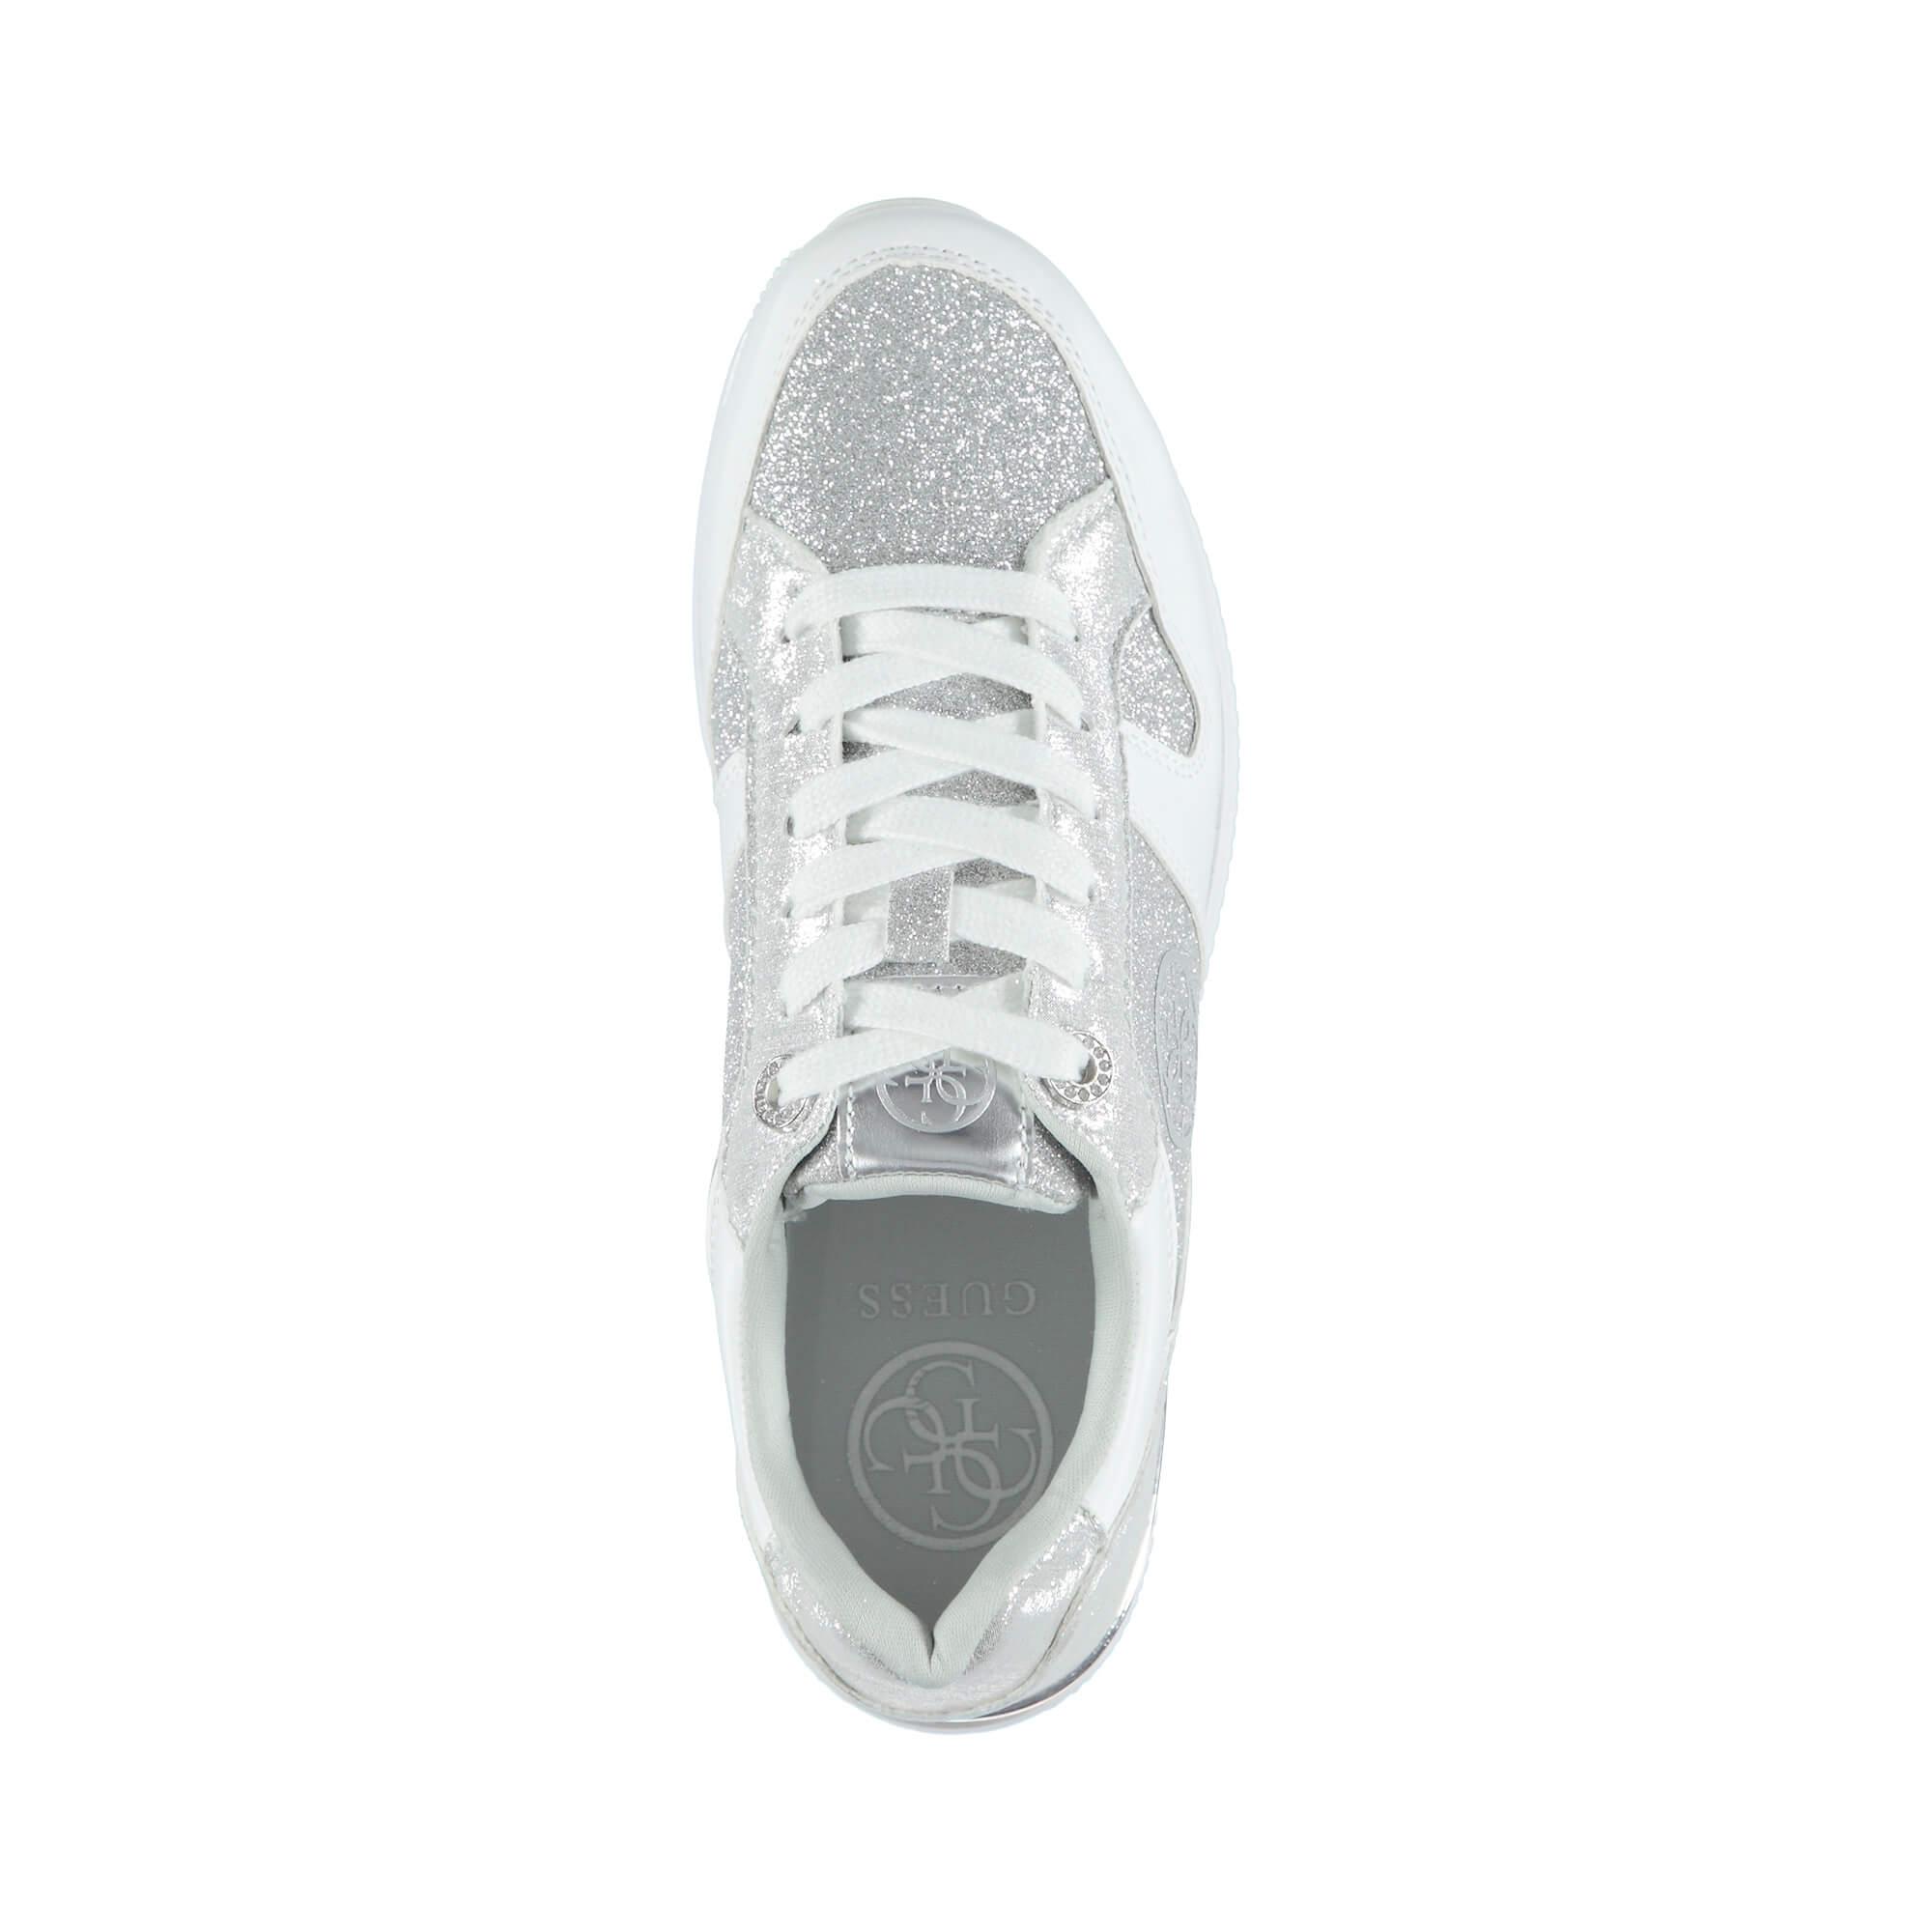 Guess Dameon Kadın Gümüş Sneaker